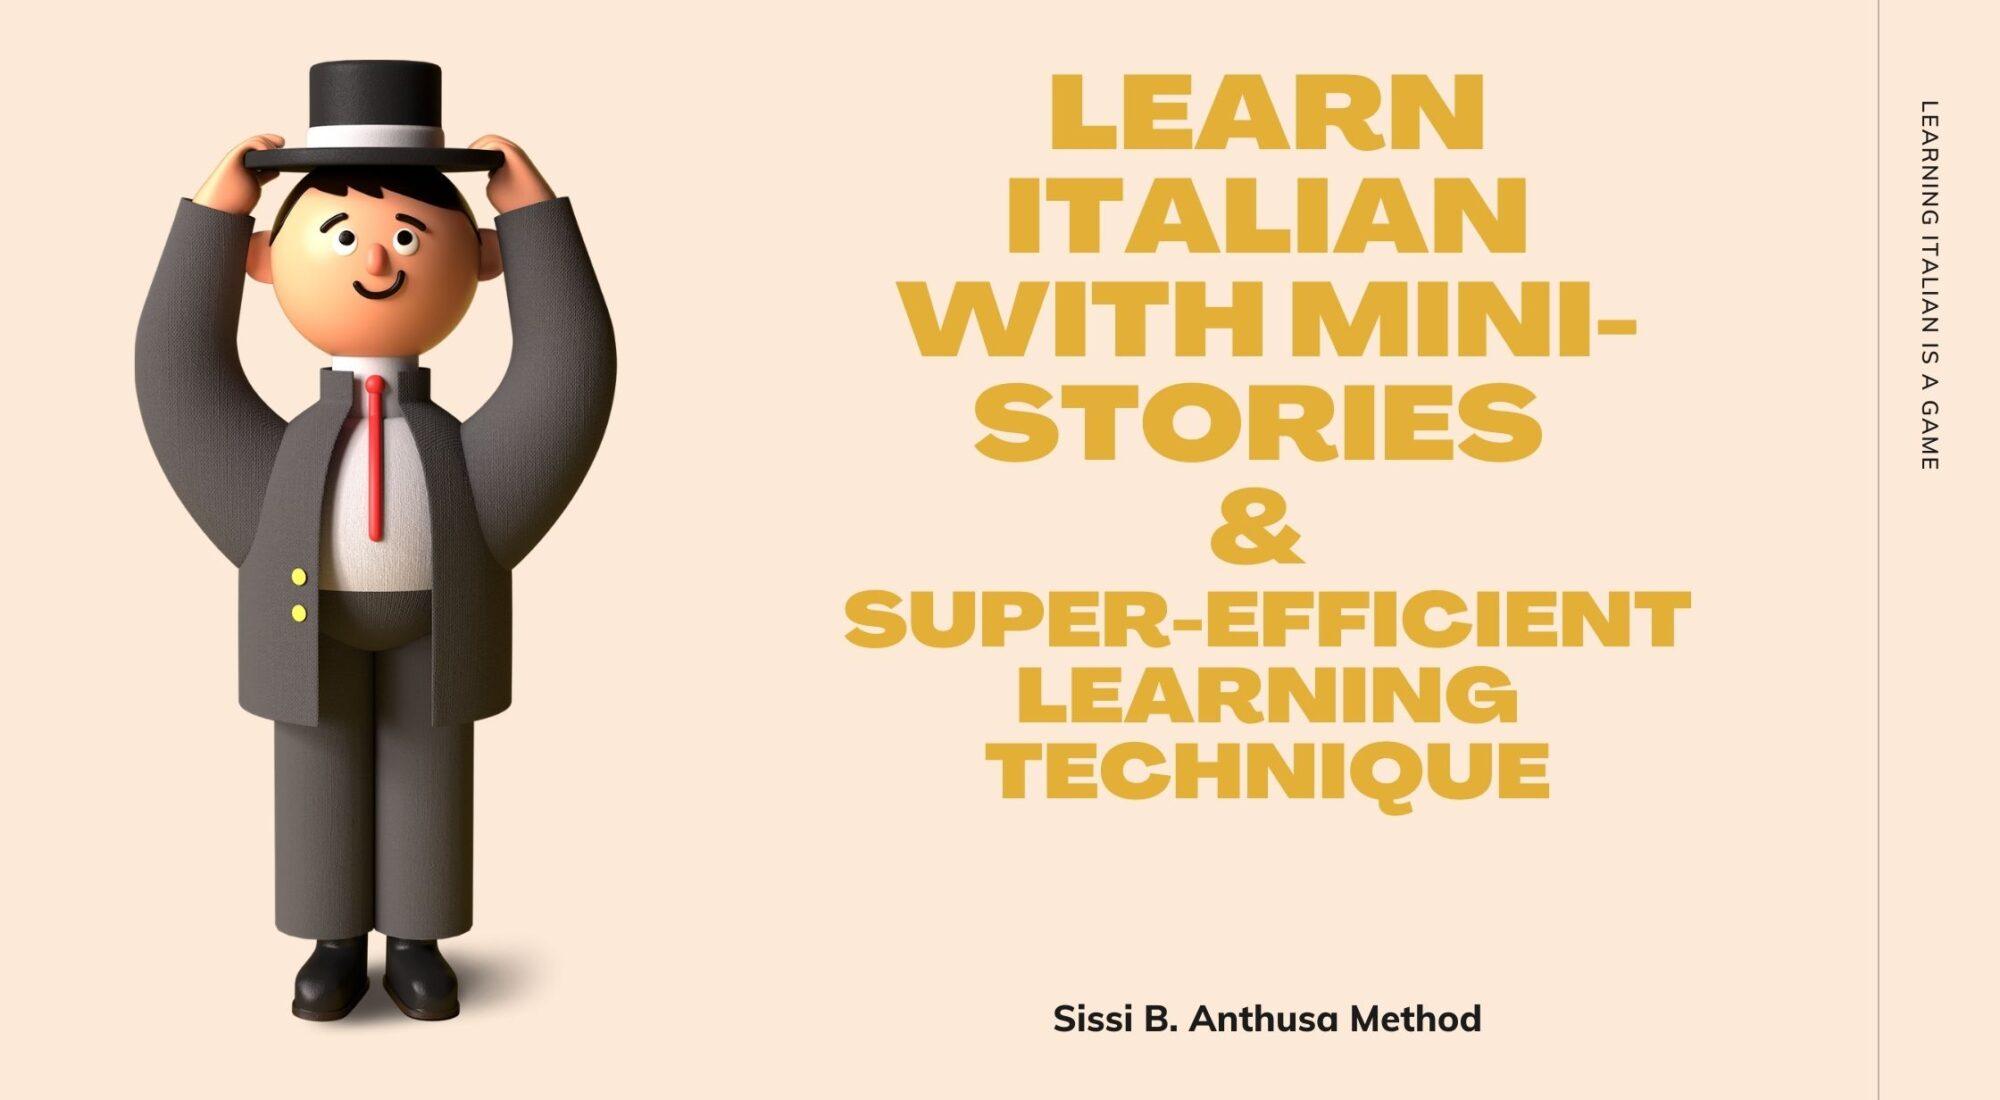 Learn Italian with mini stories